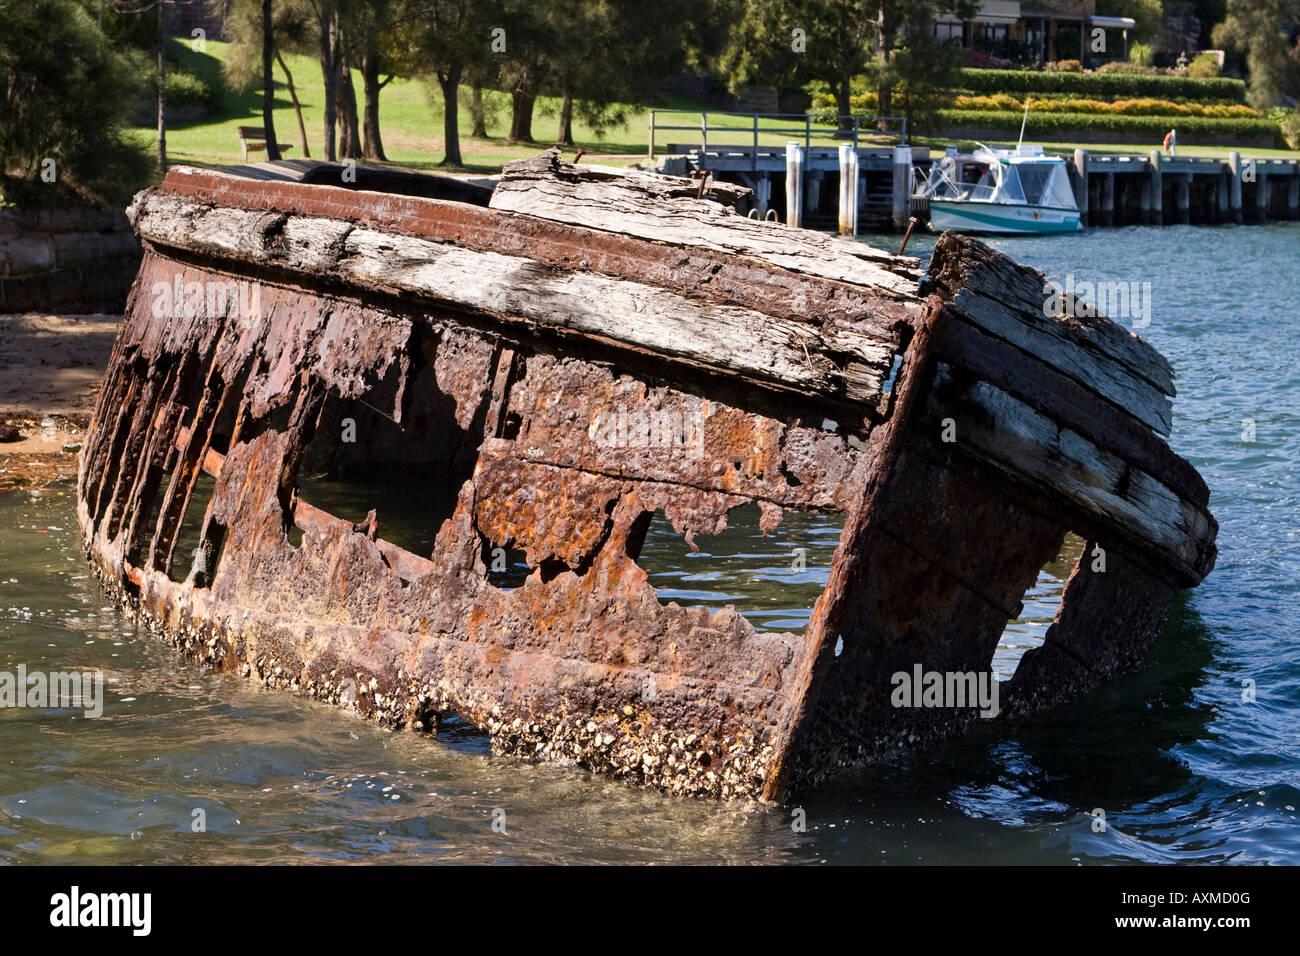 Hopper Barge Stock Photos & Hopper Barge Stock Images - Alamy